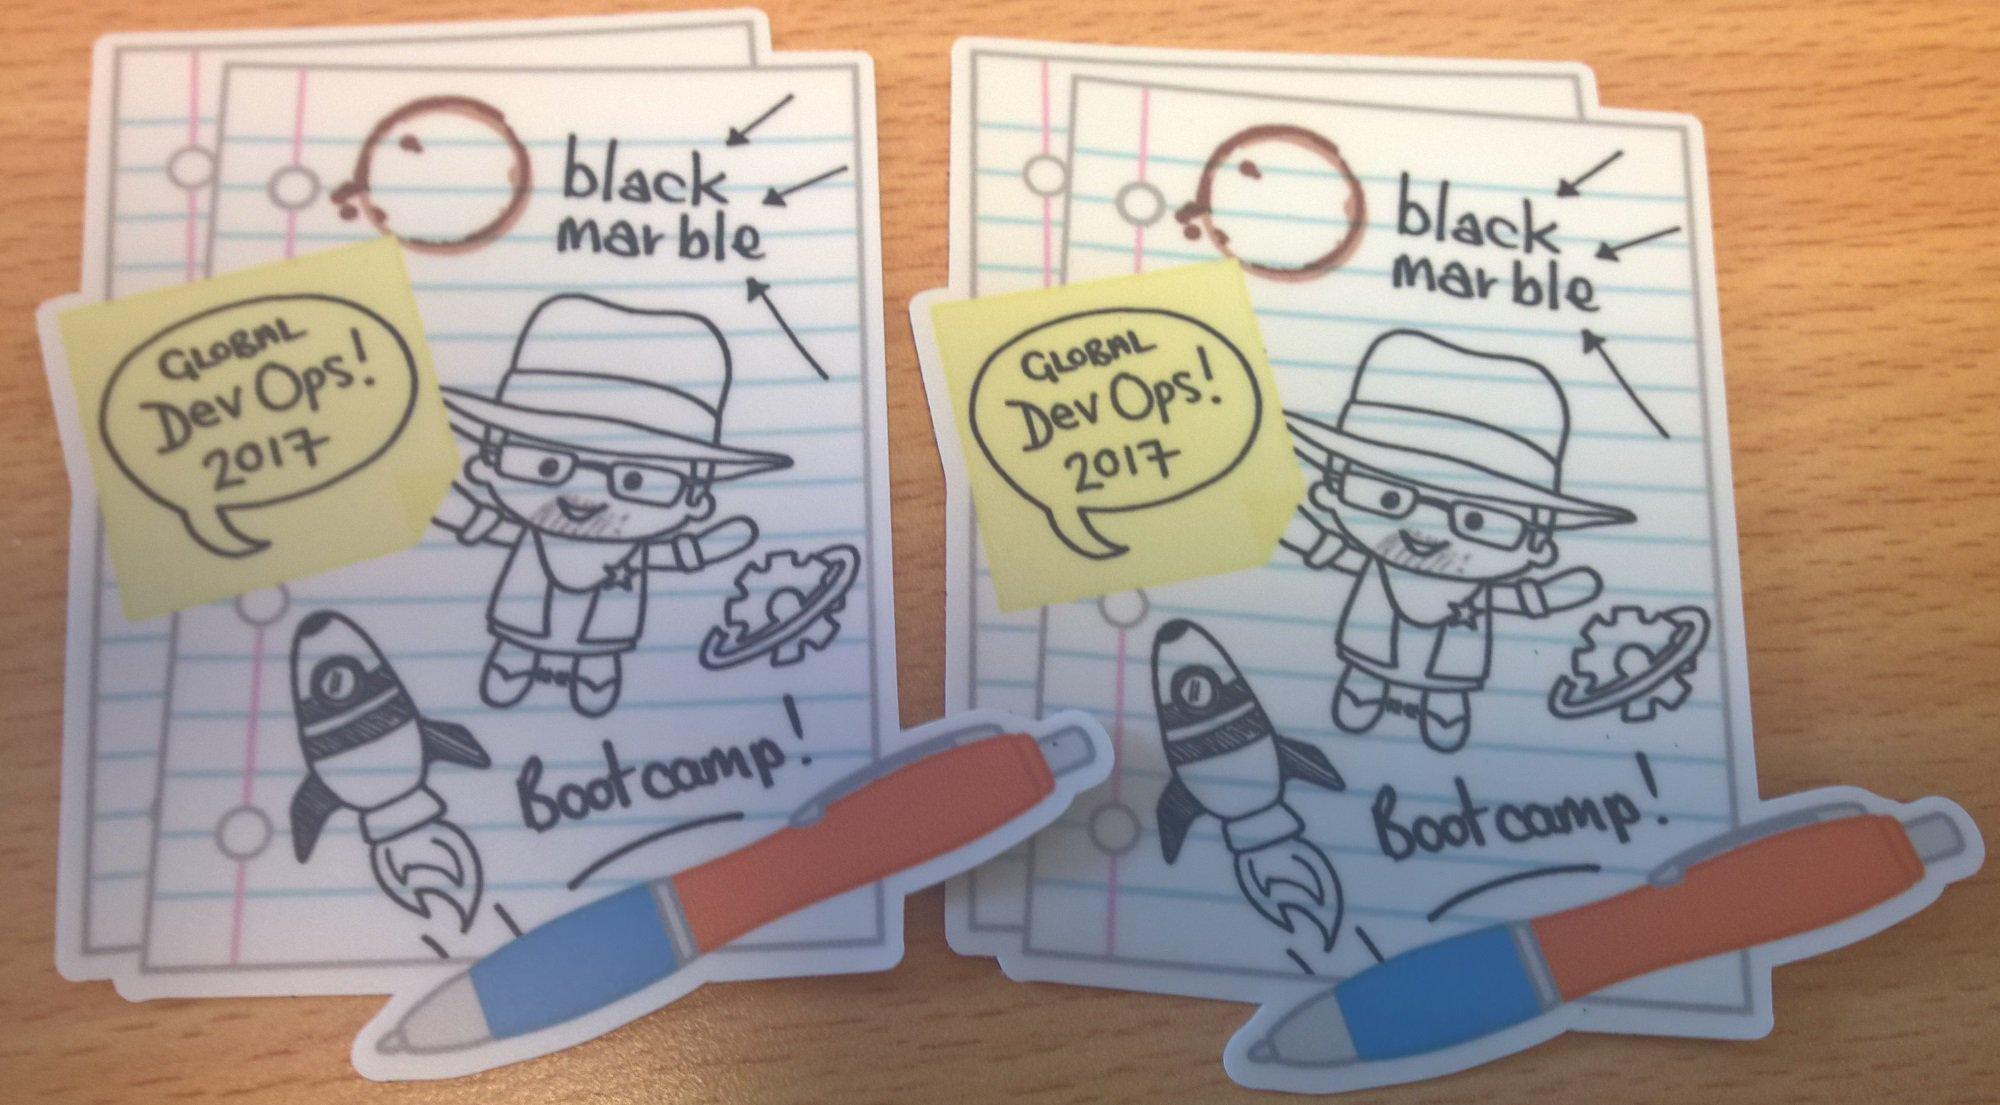 Got some great Global #DevOps Bootcamp stickers for Saturday! #gdbc! Featuring our own #ALMRanger @gdevopsbc https://t.co/3nnehKqM3M